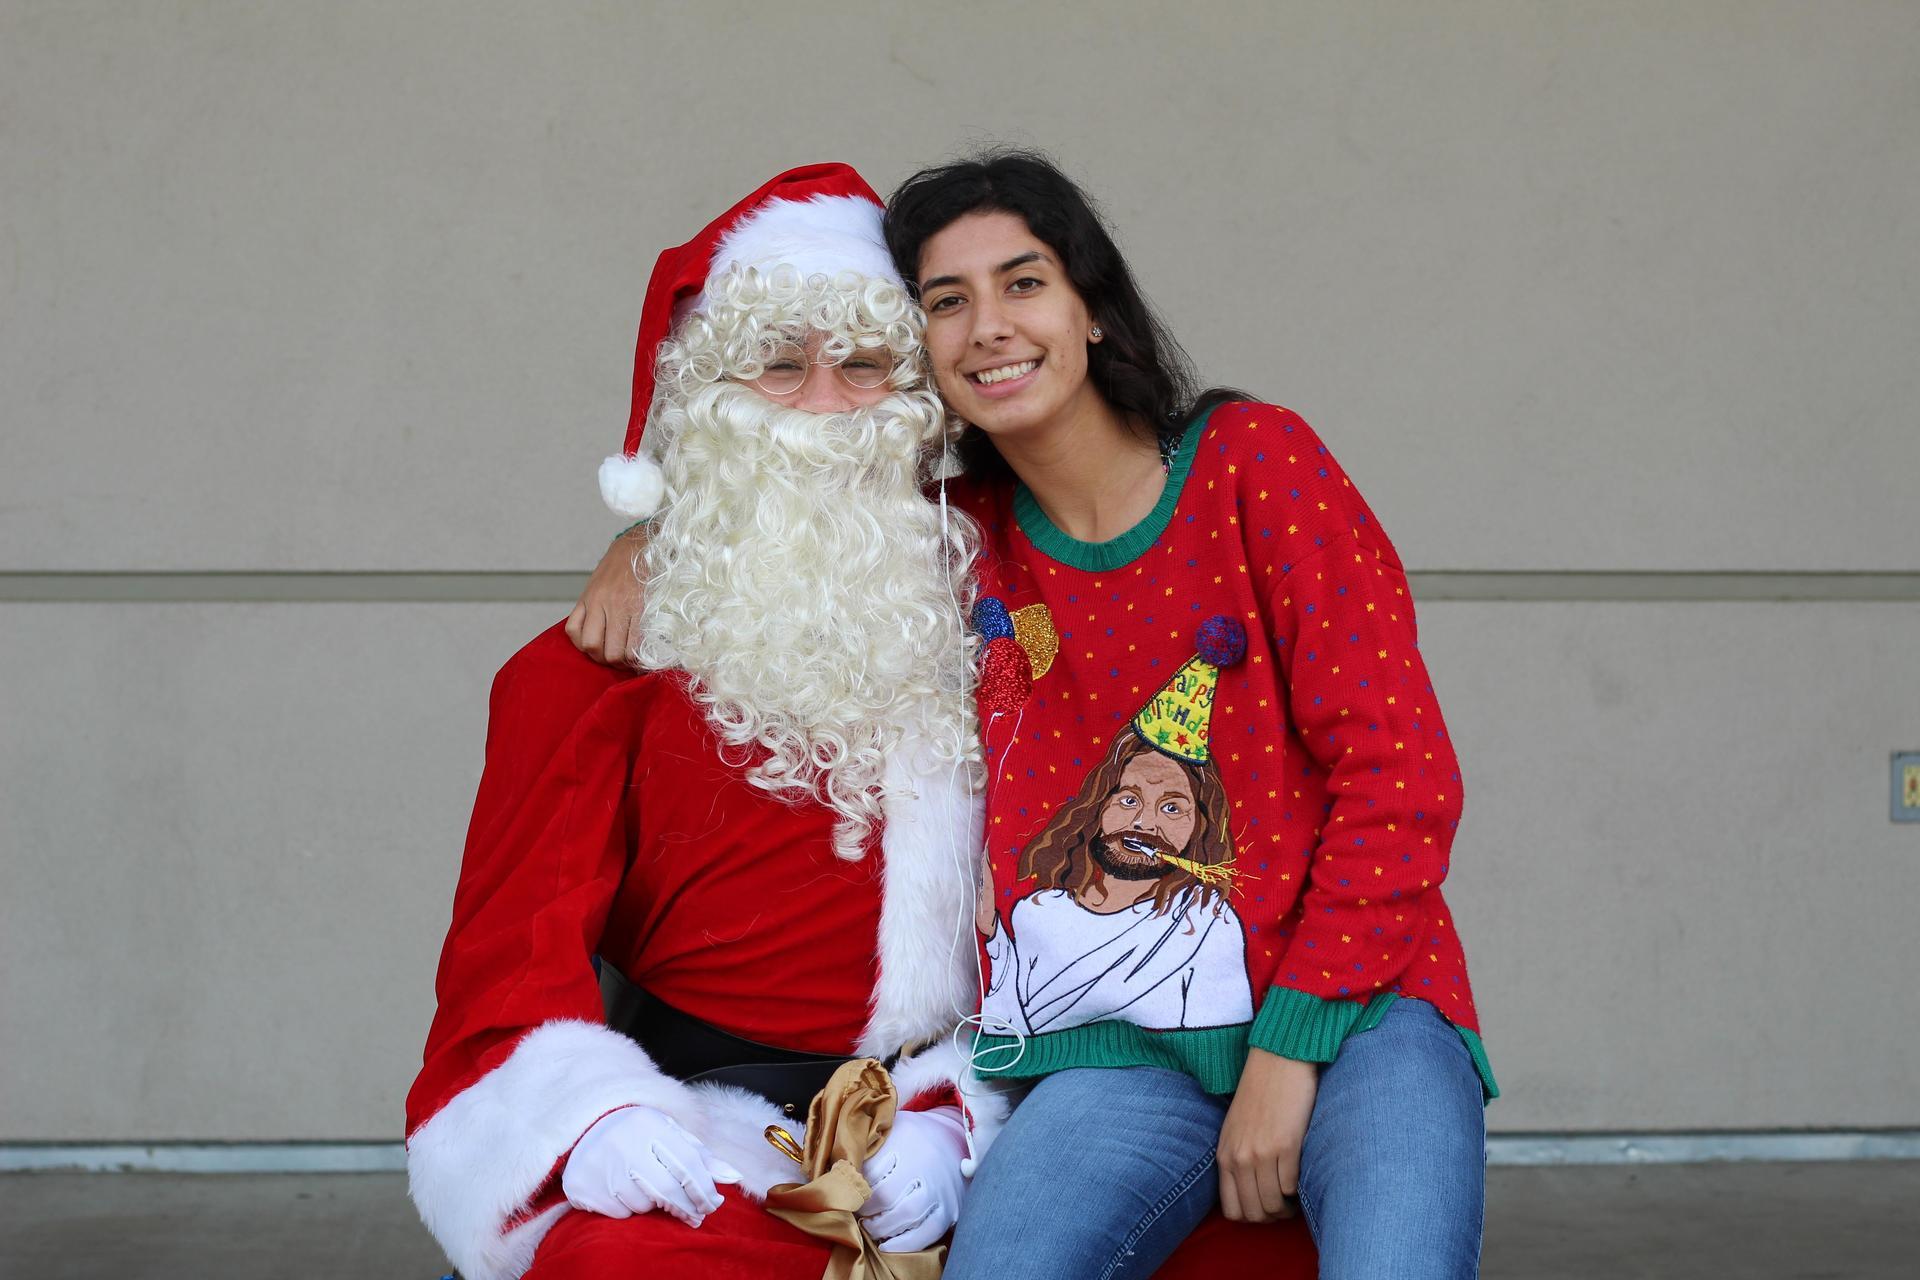 Priscilla Foster sits on Santa's lap